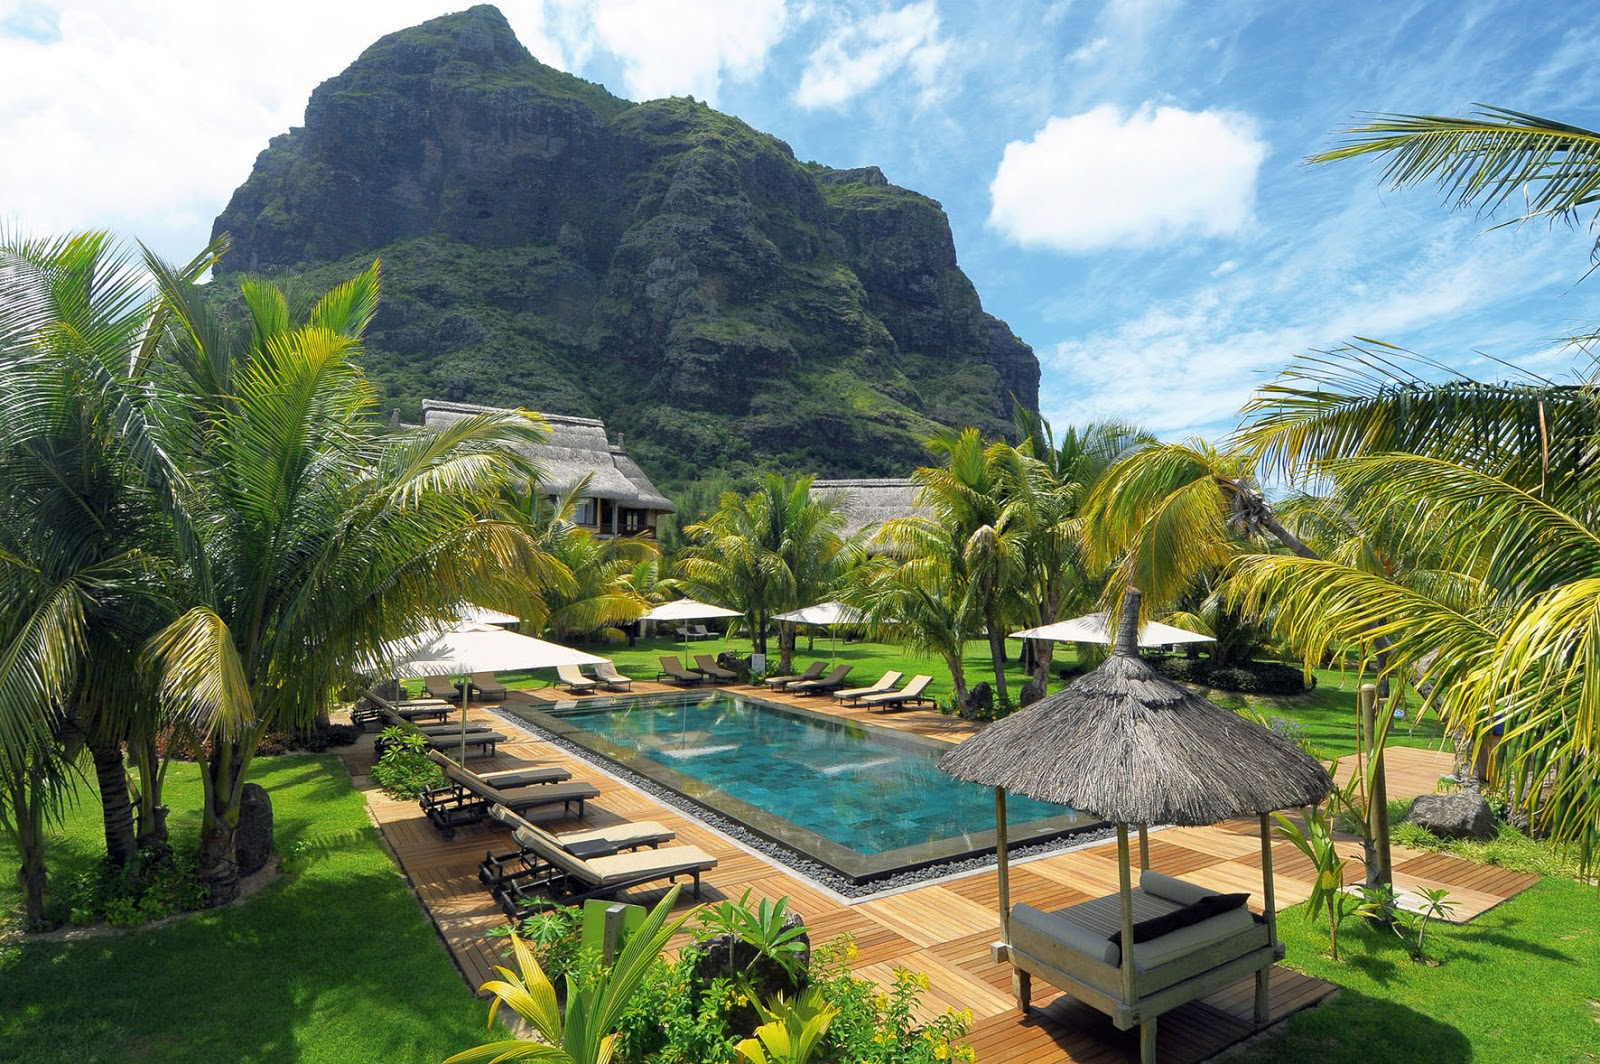 Hotel Gran Paradis Campitello